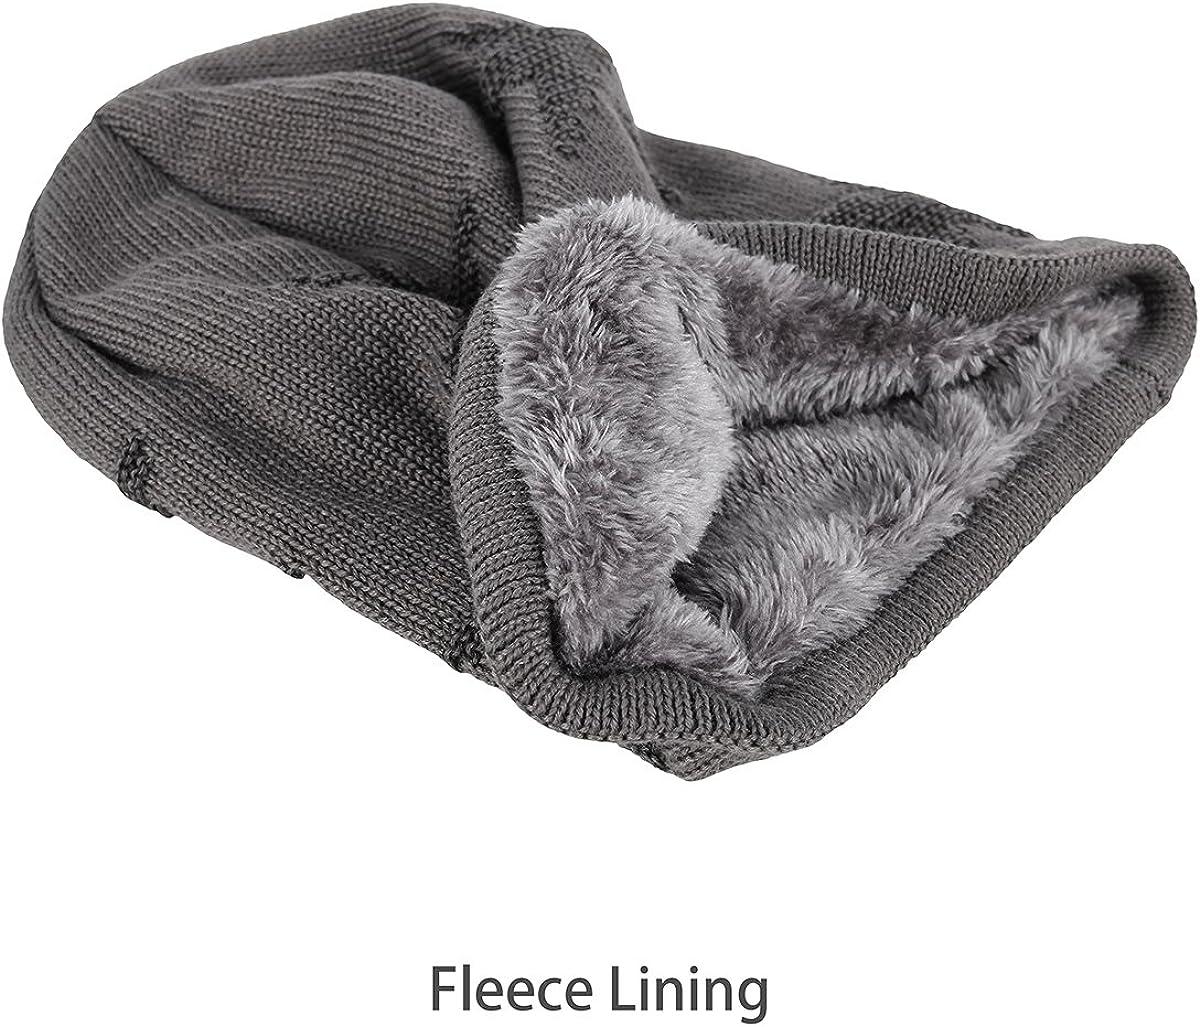 OMECHY Winter Knit Slouchy Beanie Hat Unisex Daily Warm Ski Skull Cap 4 Colors